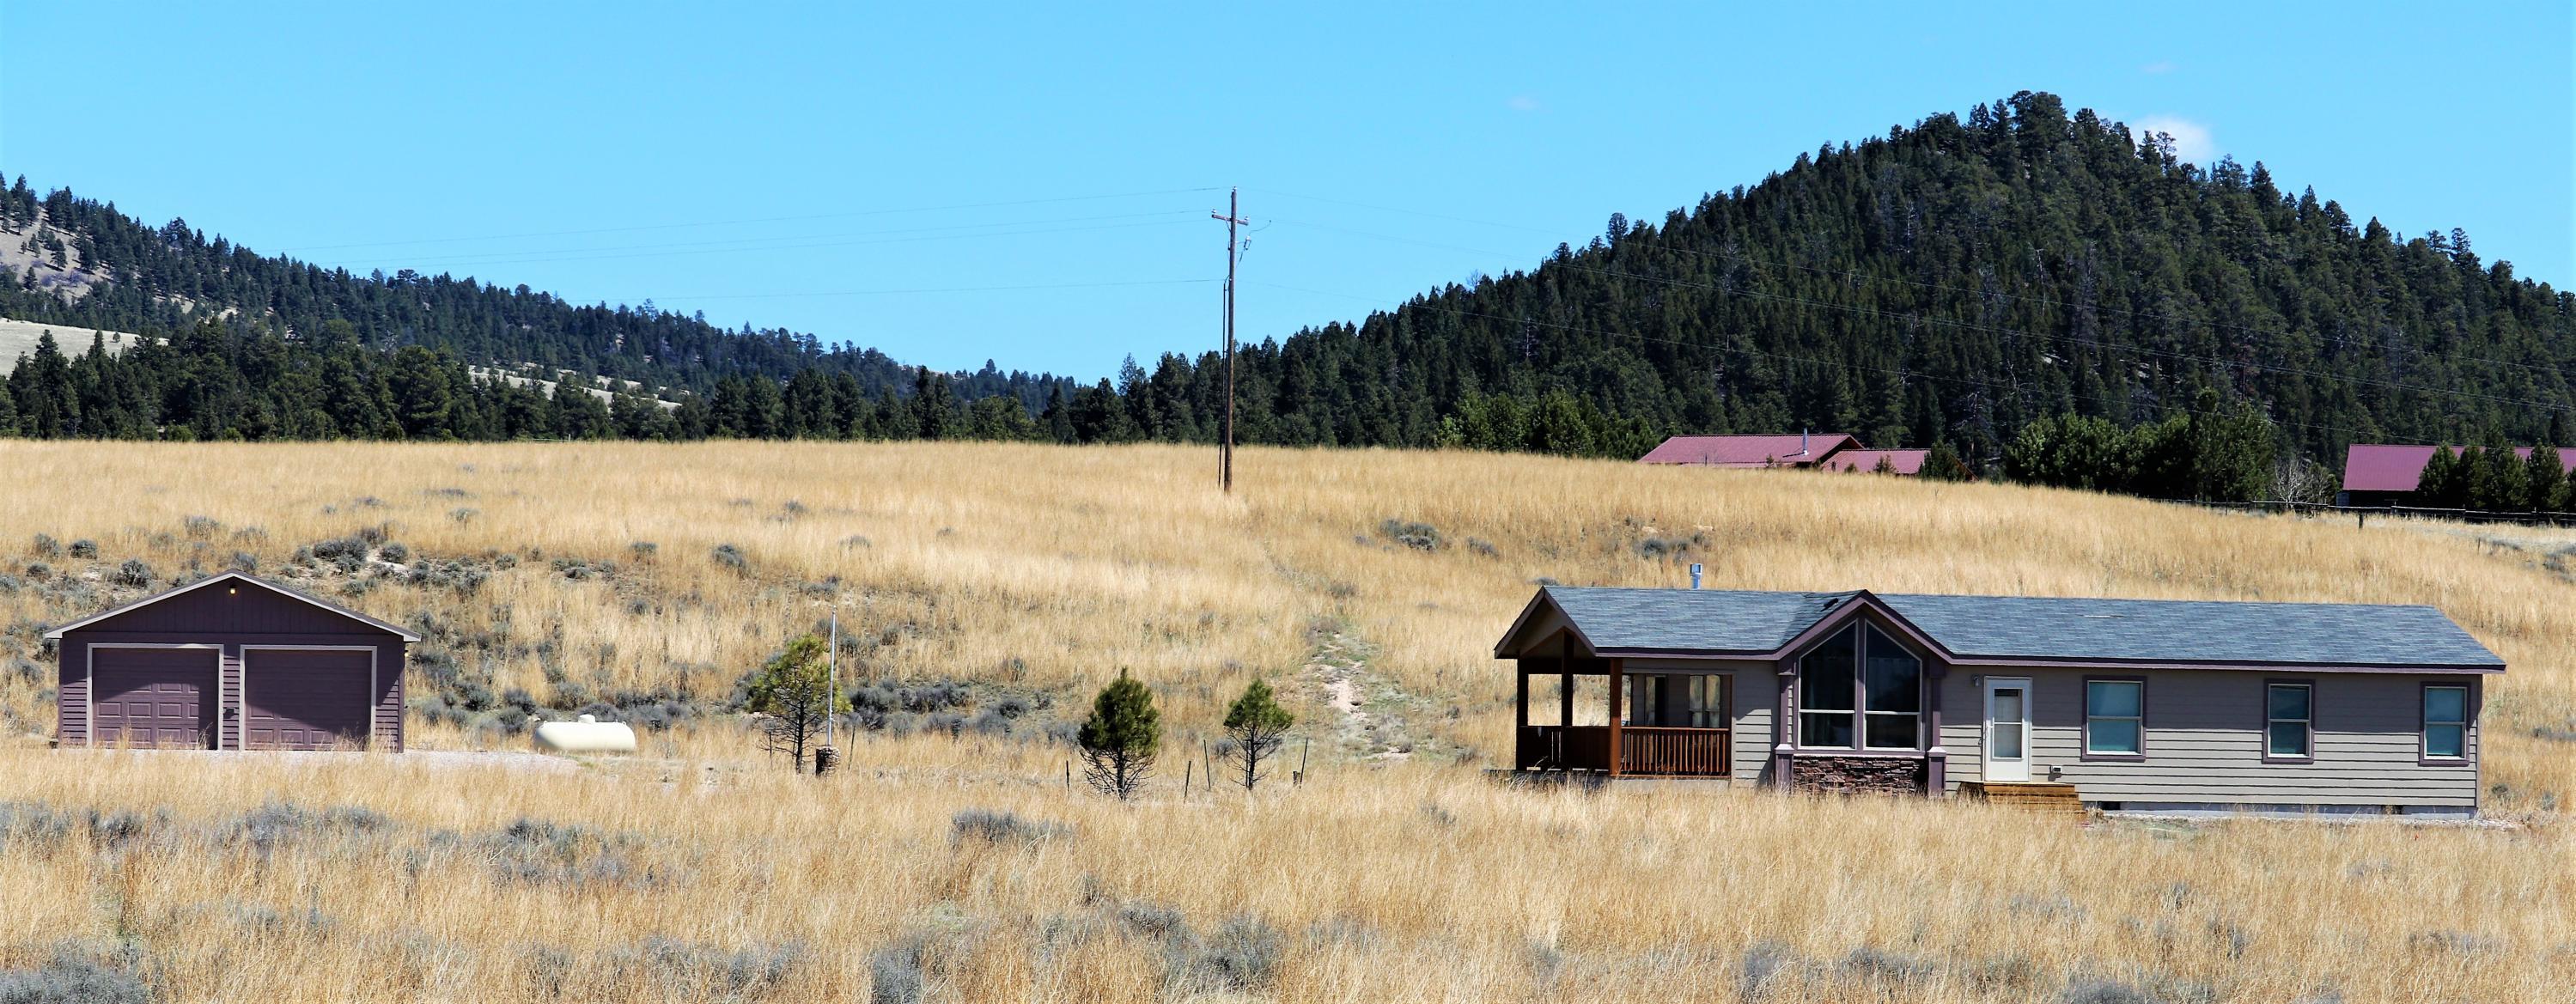 4 N Star Road, White Sulphur Springs, MT 59645